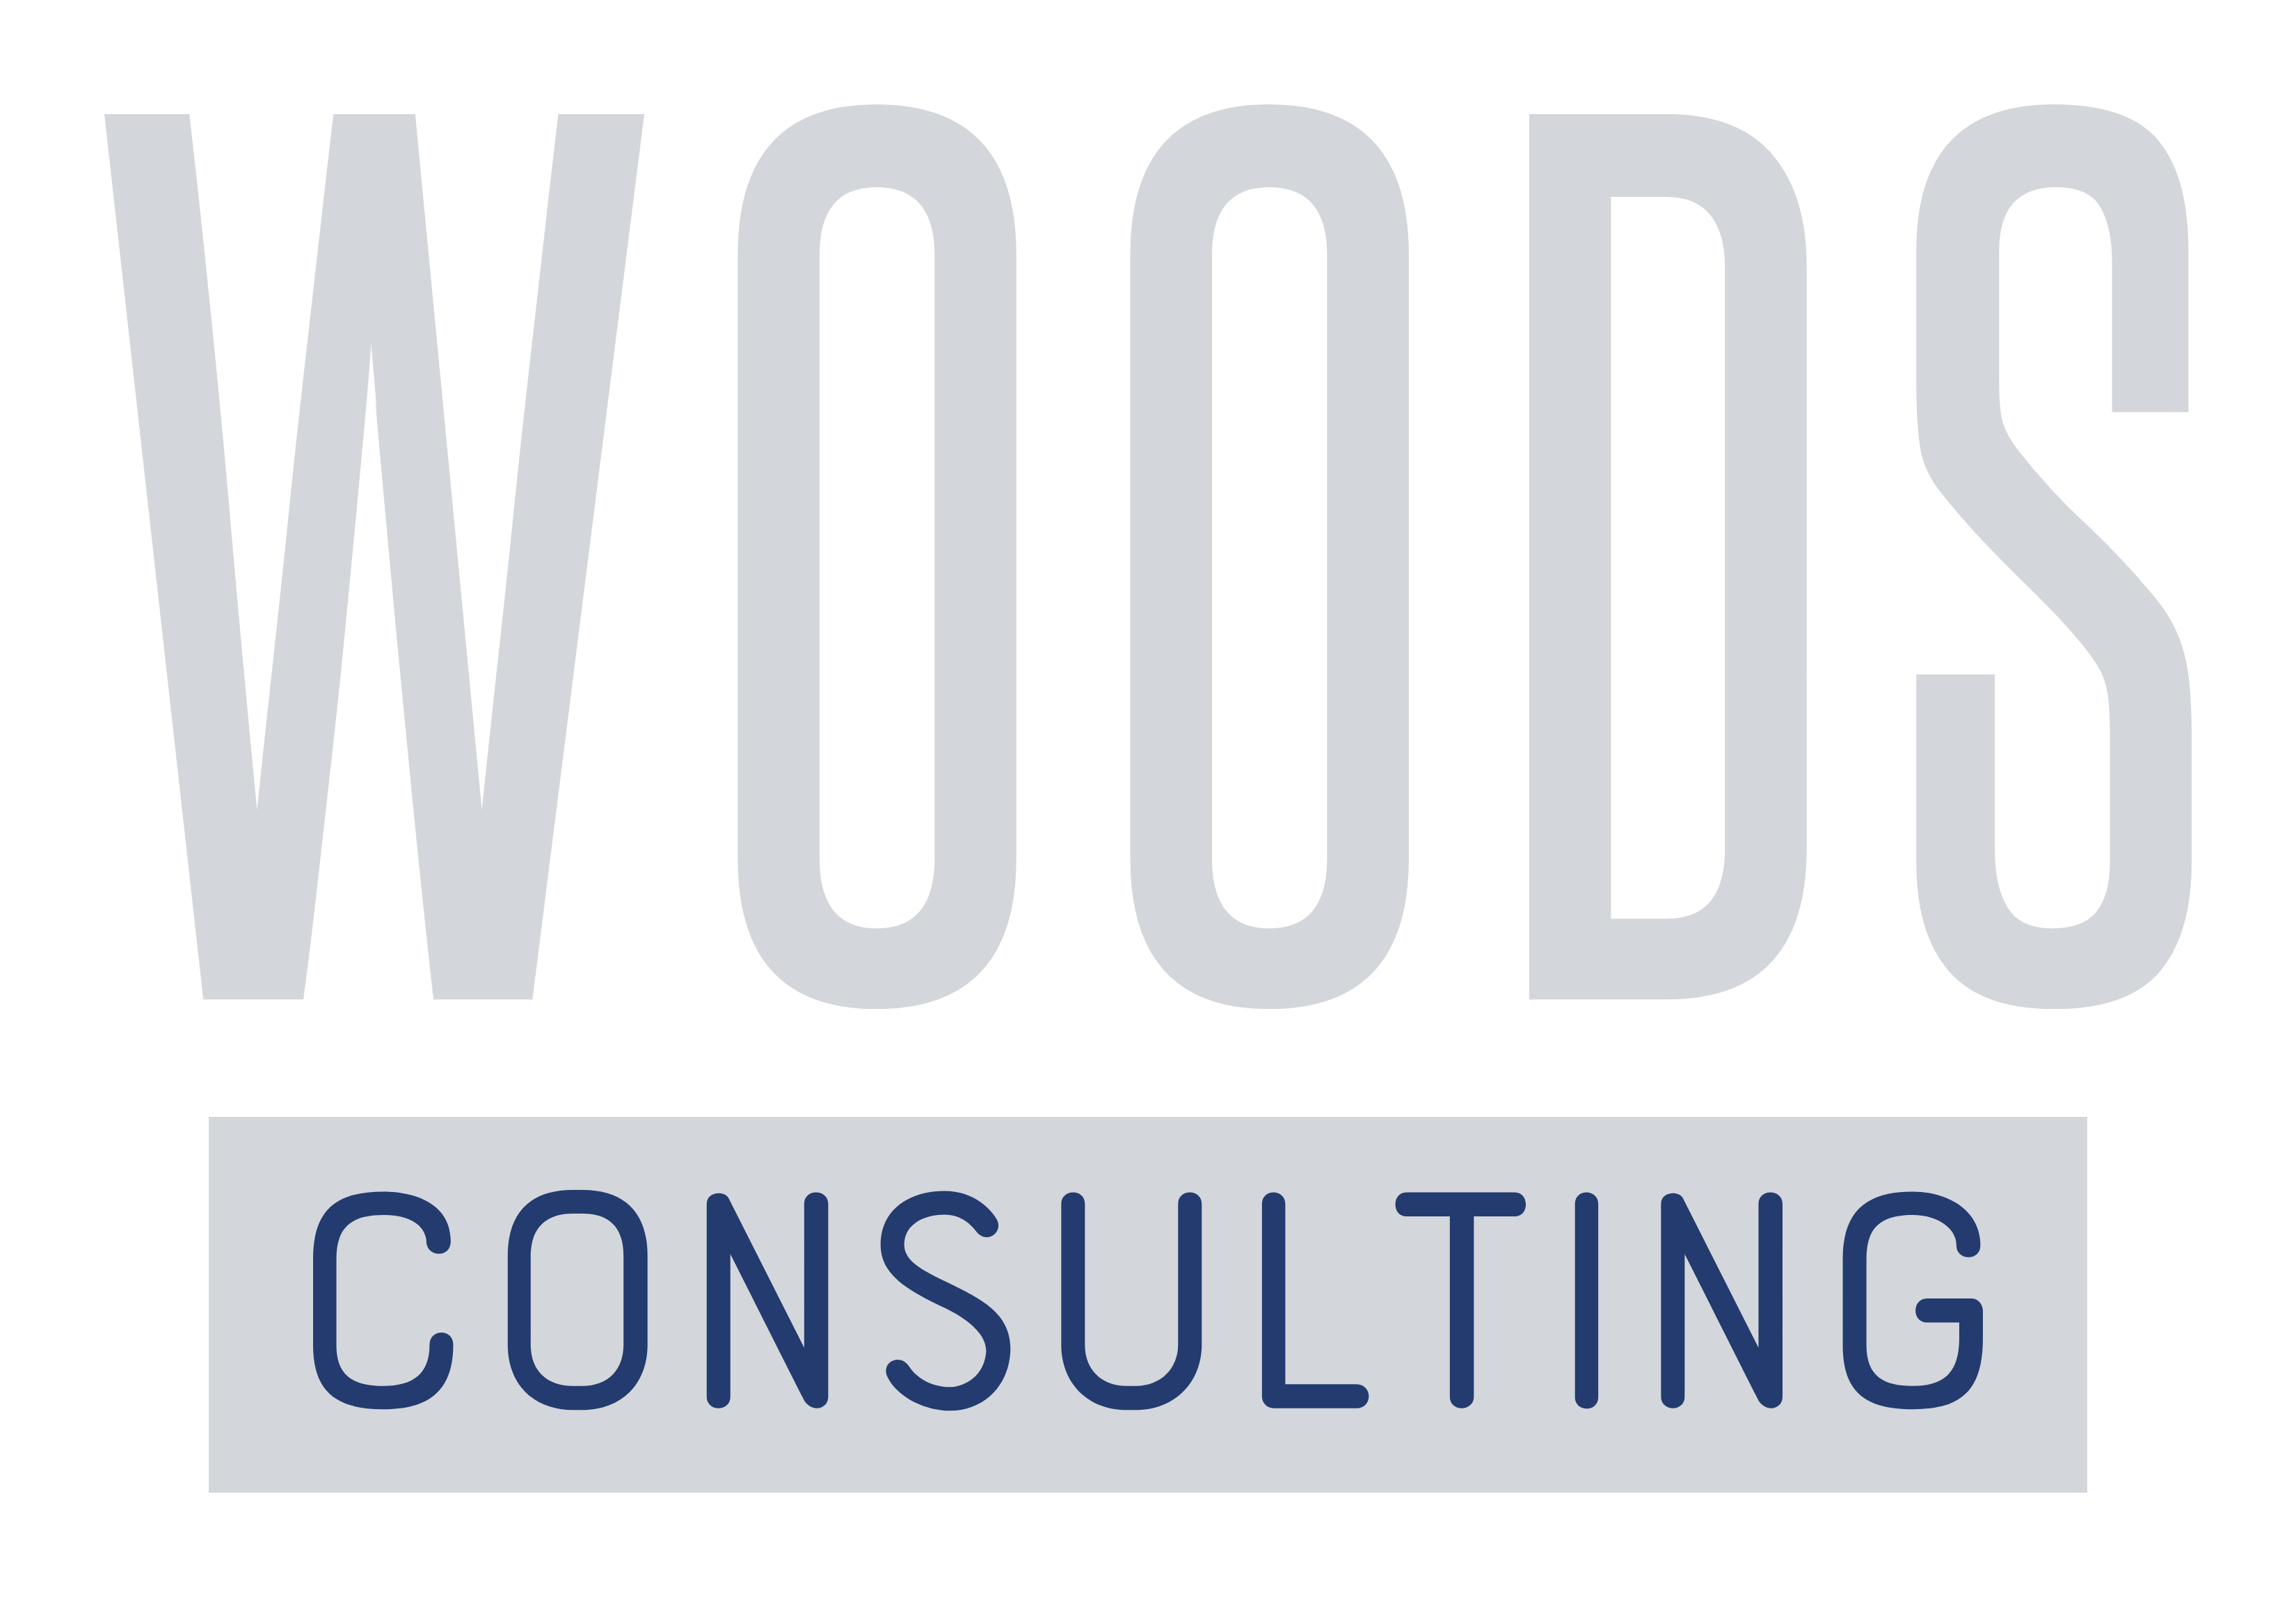 Microsoft Dynamics 365 Consultant - Zach Woods